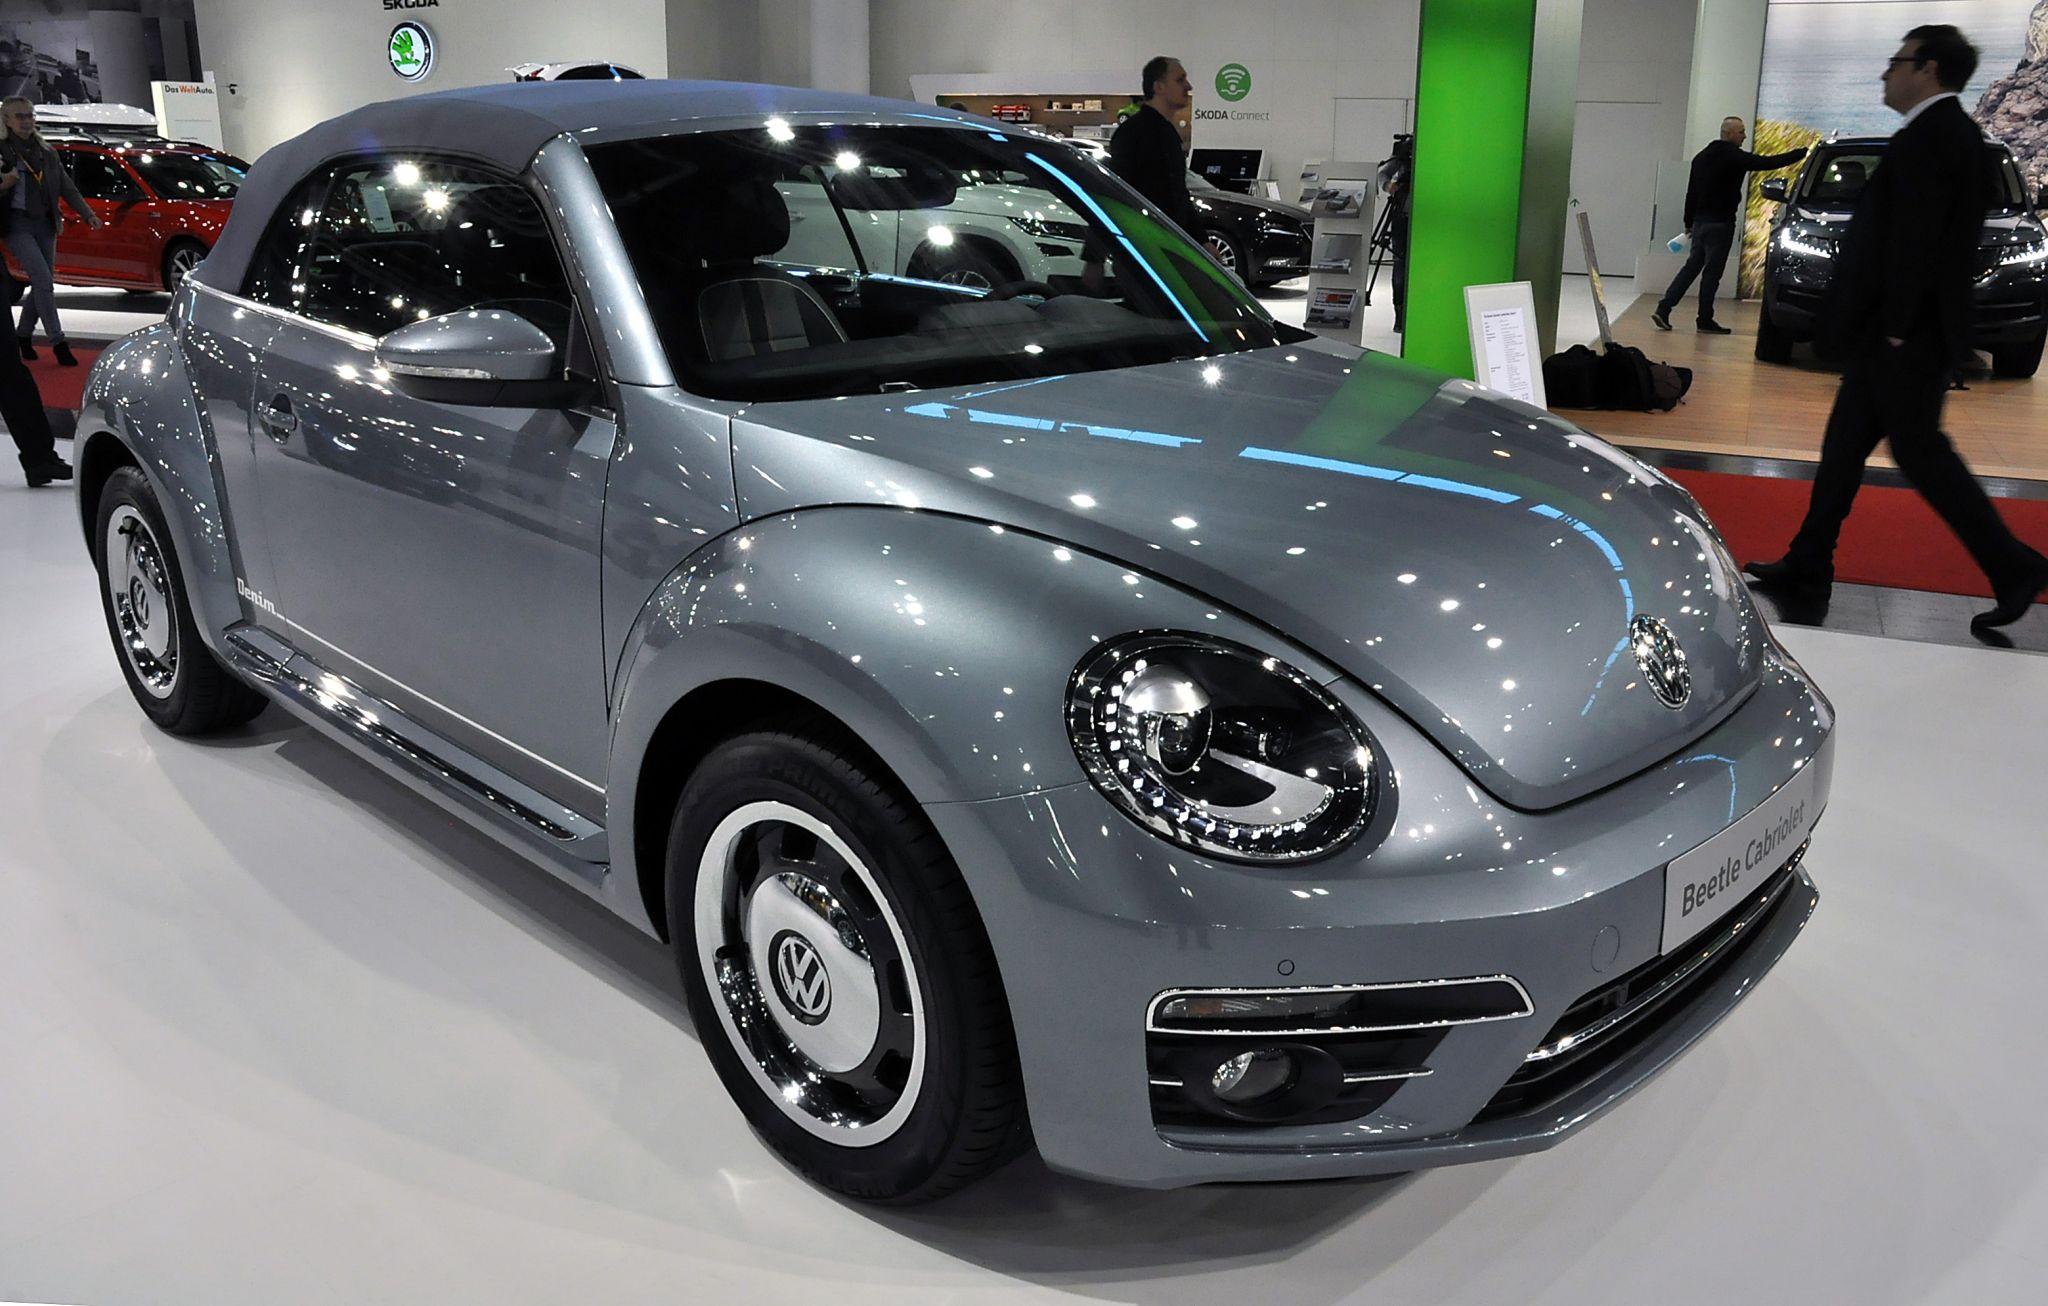 Volkswagen to stop making Beetles Houston Chronicle